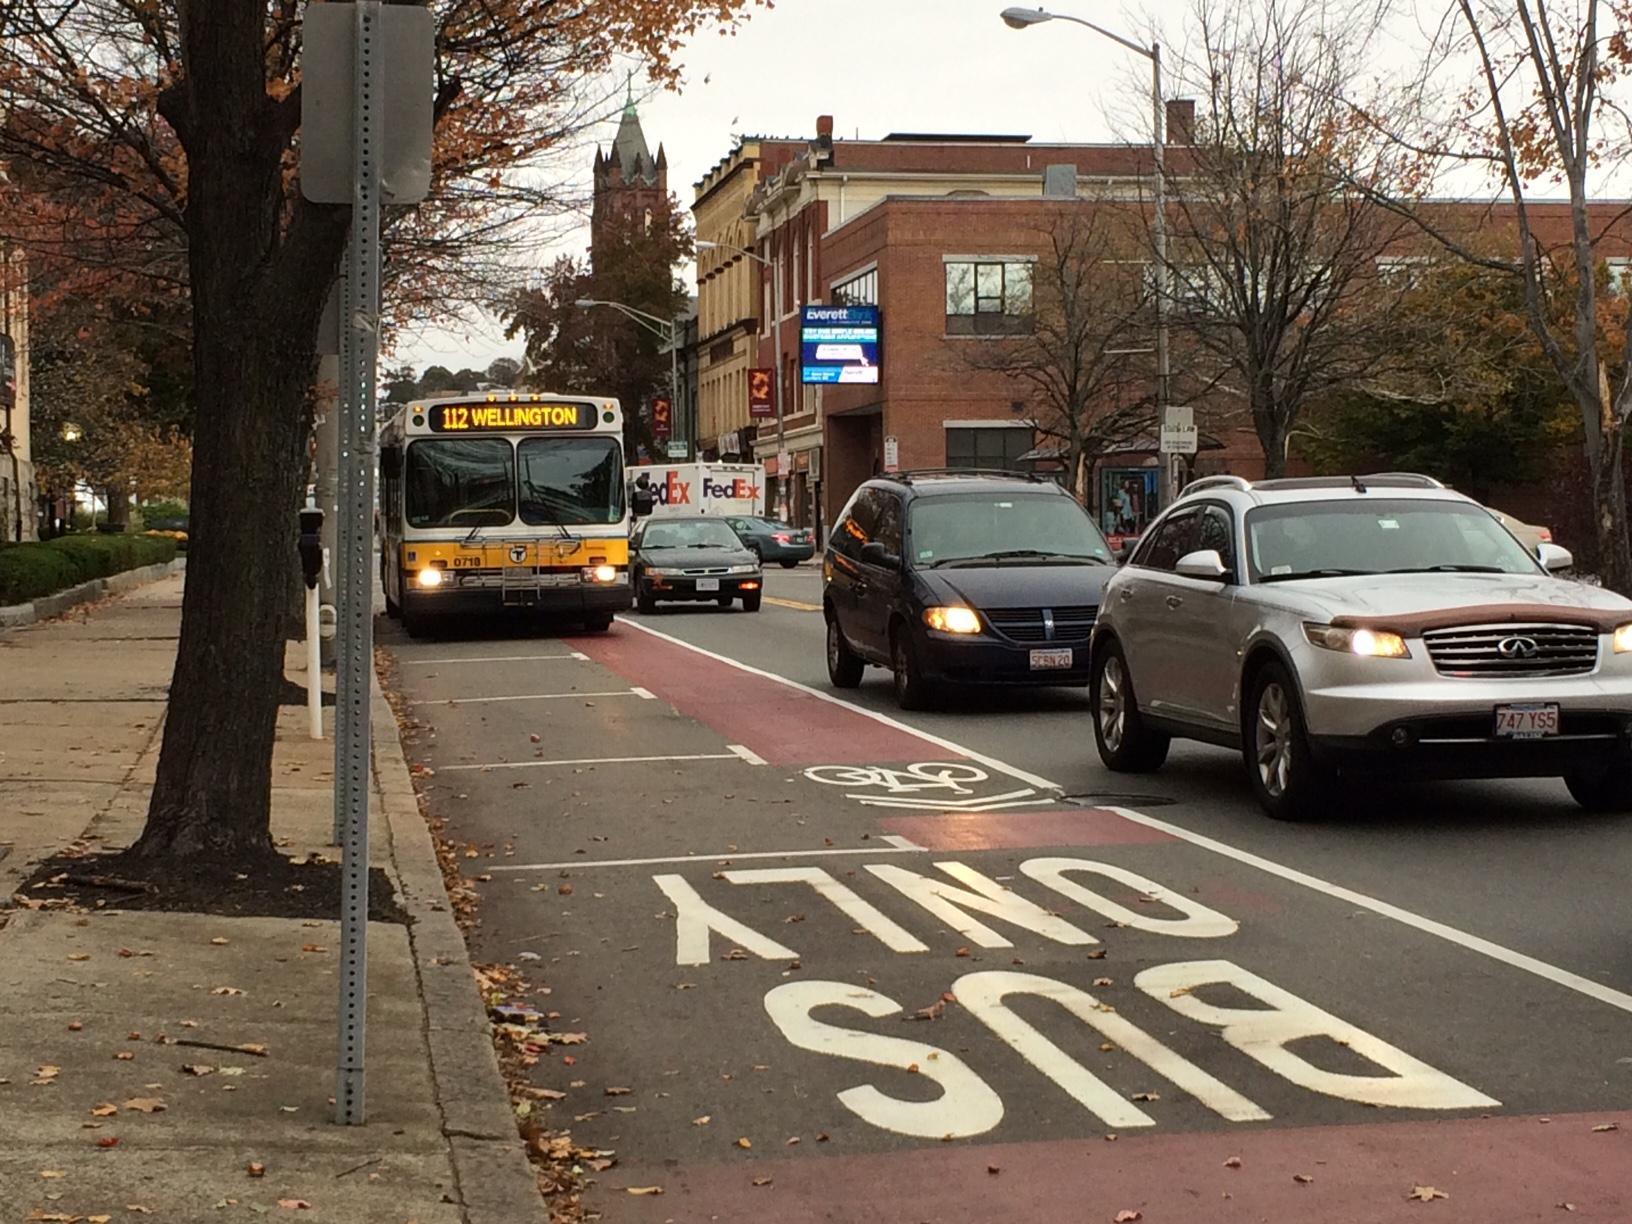 Bus lane on Broadway in Everett